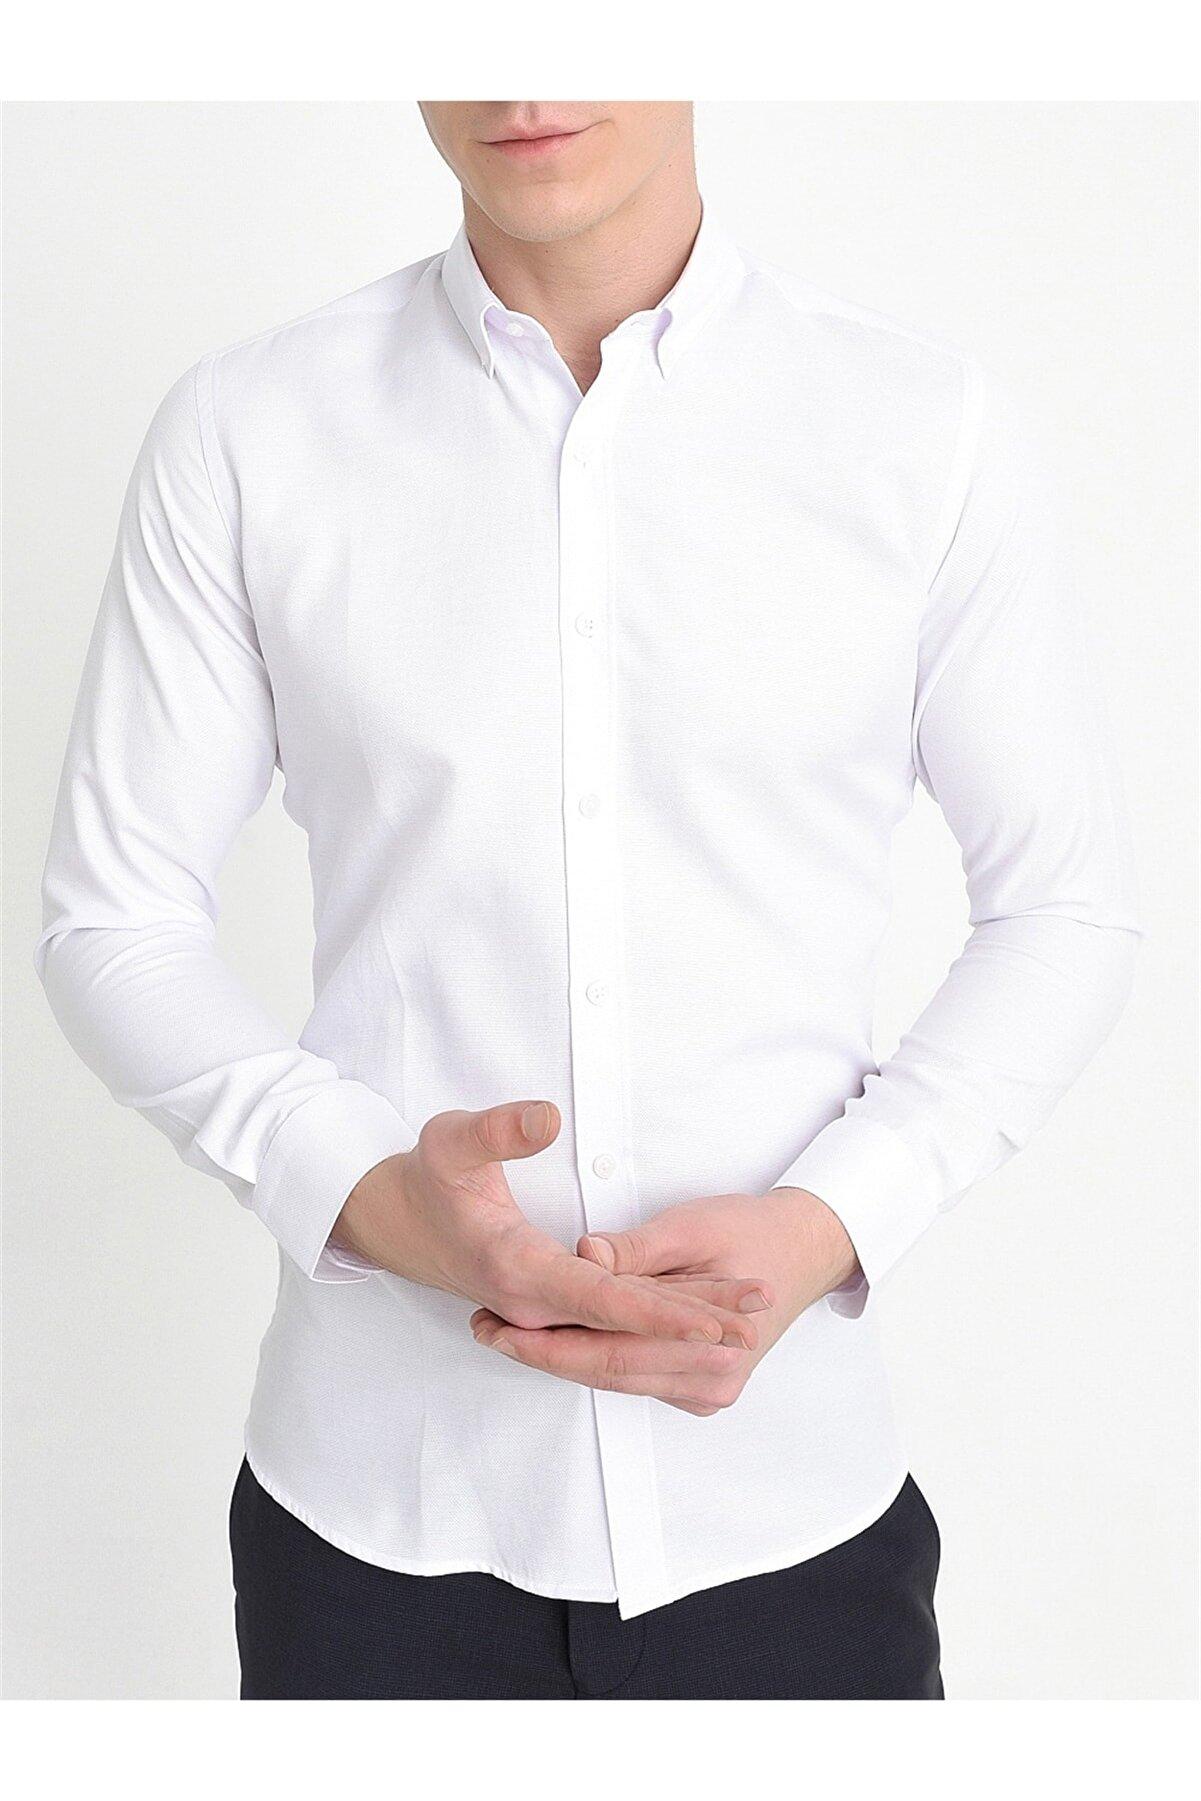 Efor Gk 560 Slim Fit Beyaz Klasik Gömlek